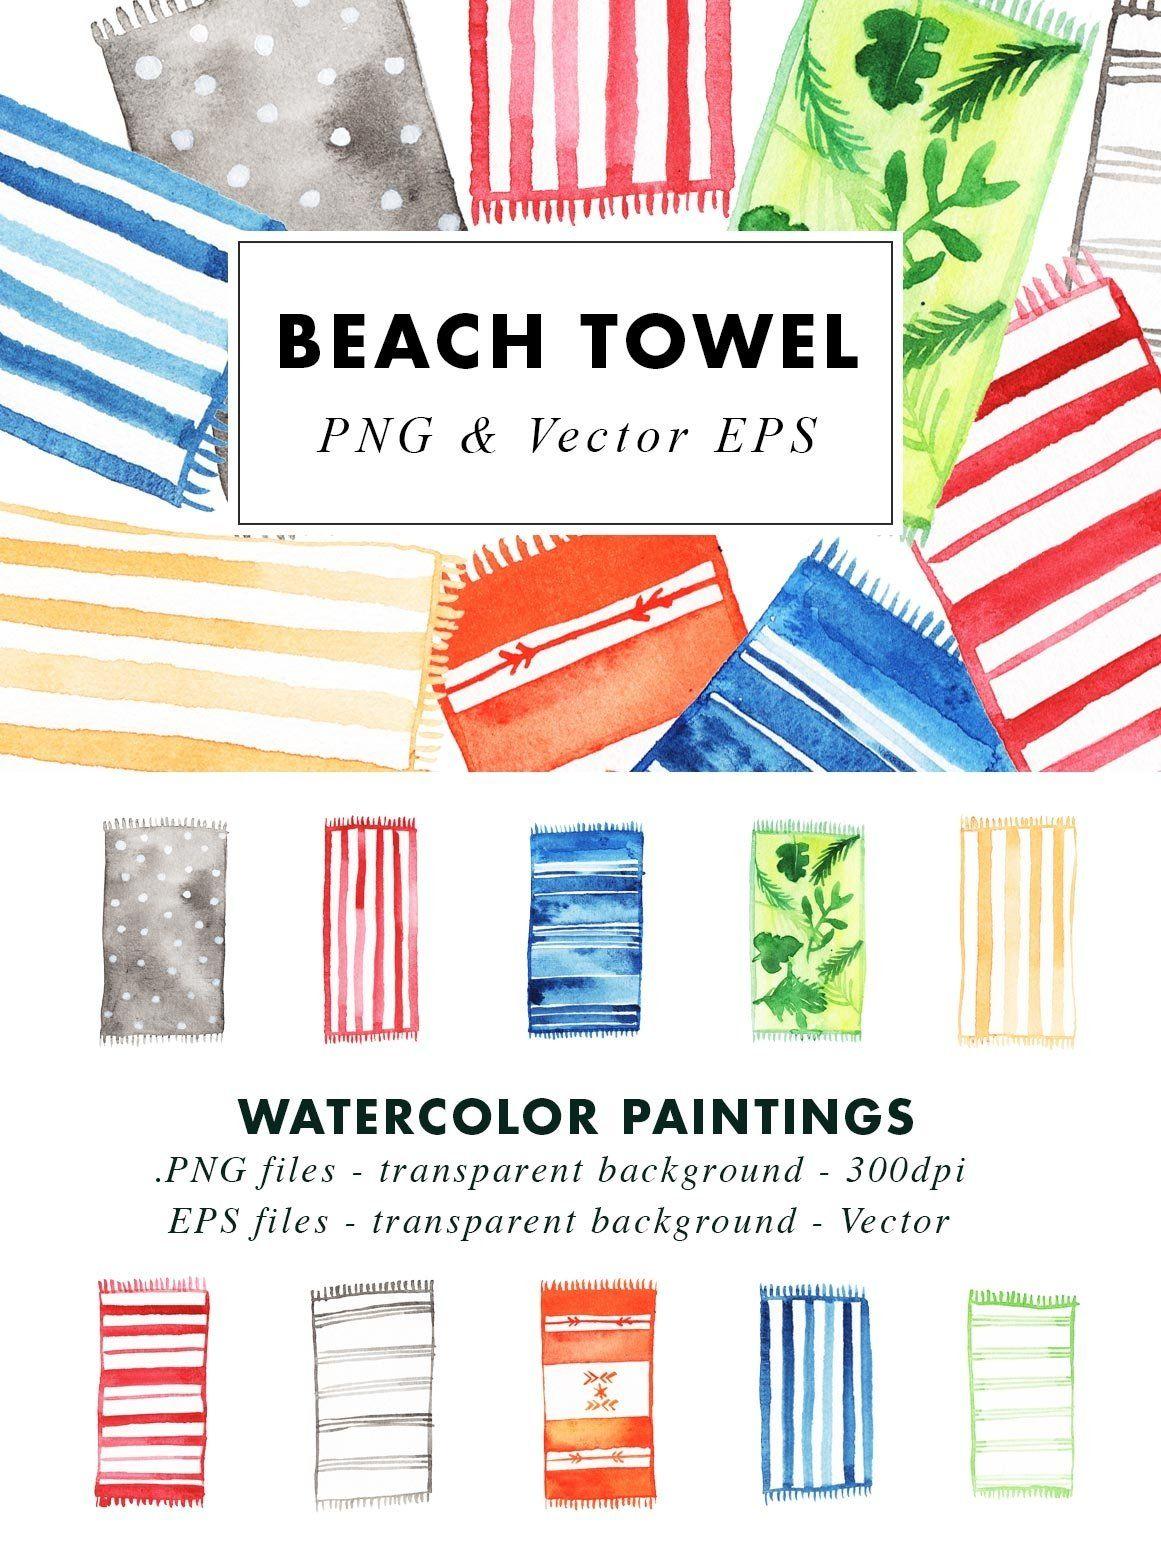 Watercolor Beach Towel Illustration Clip Art In Png Vector In 2021 Beach Watercolor Beach Towel Clip Art